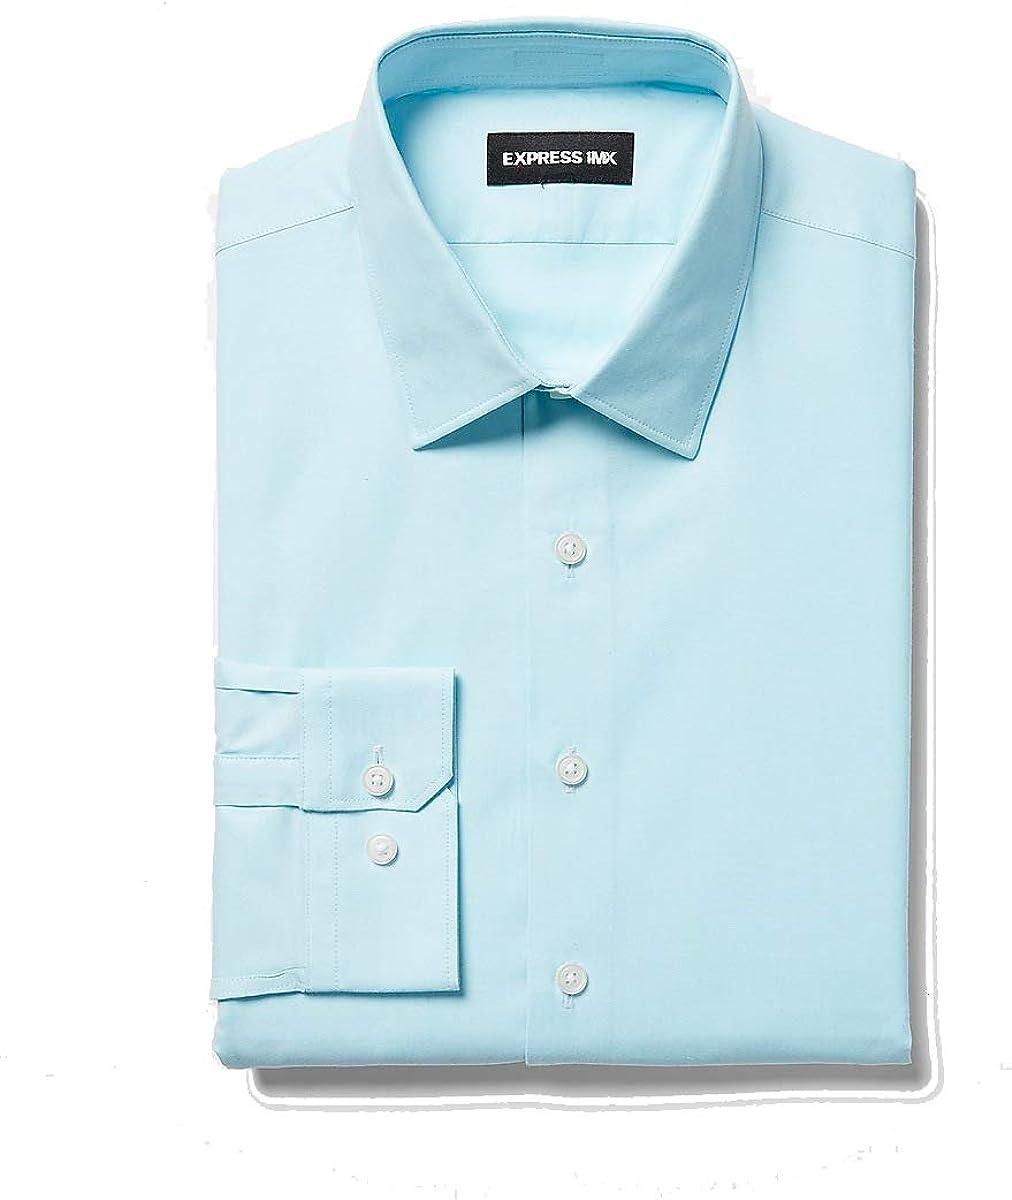 Express Slim Fit Easy Care 1MX Dress Shirt